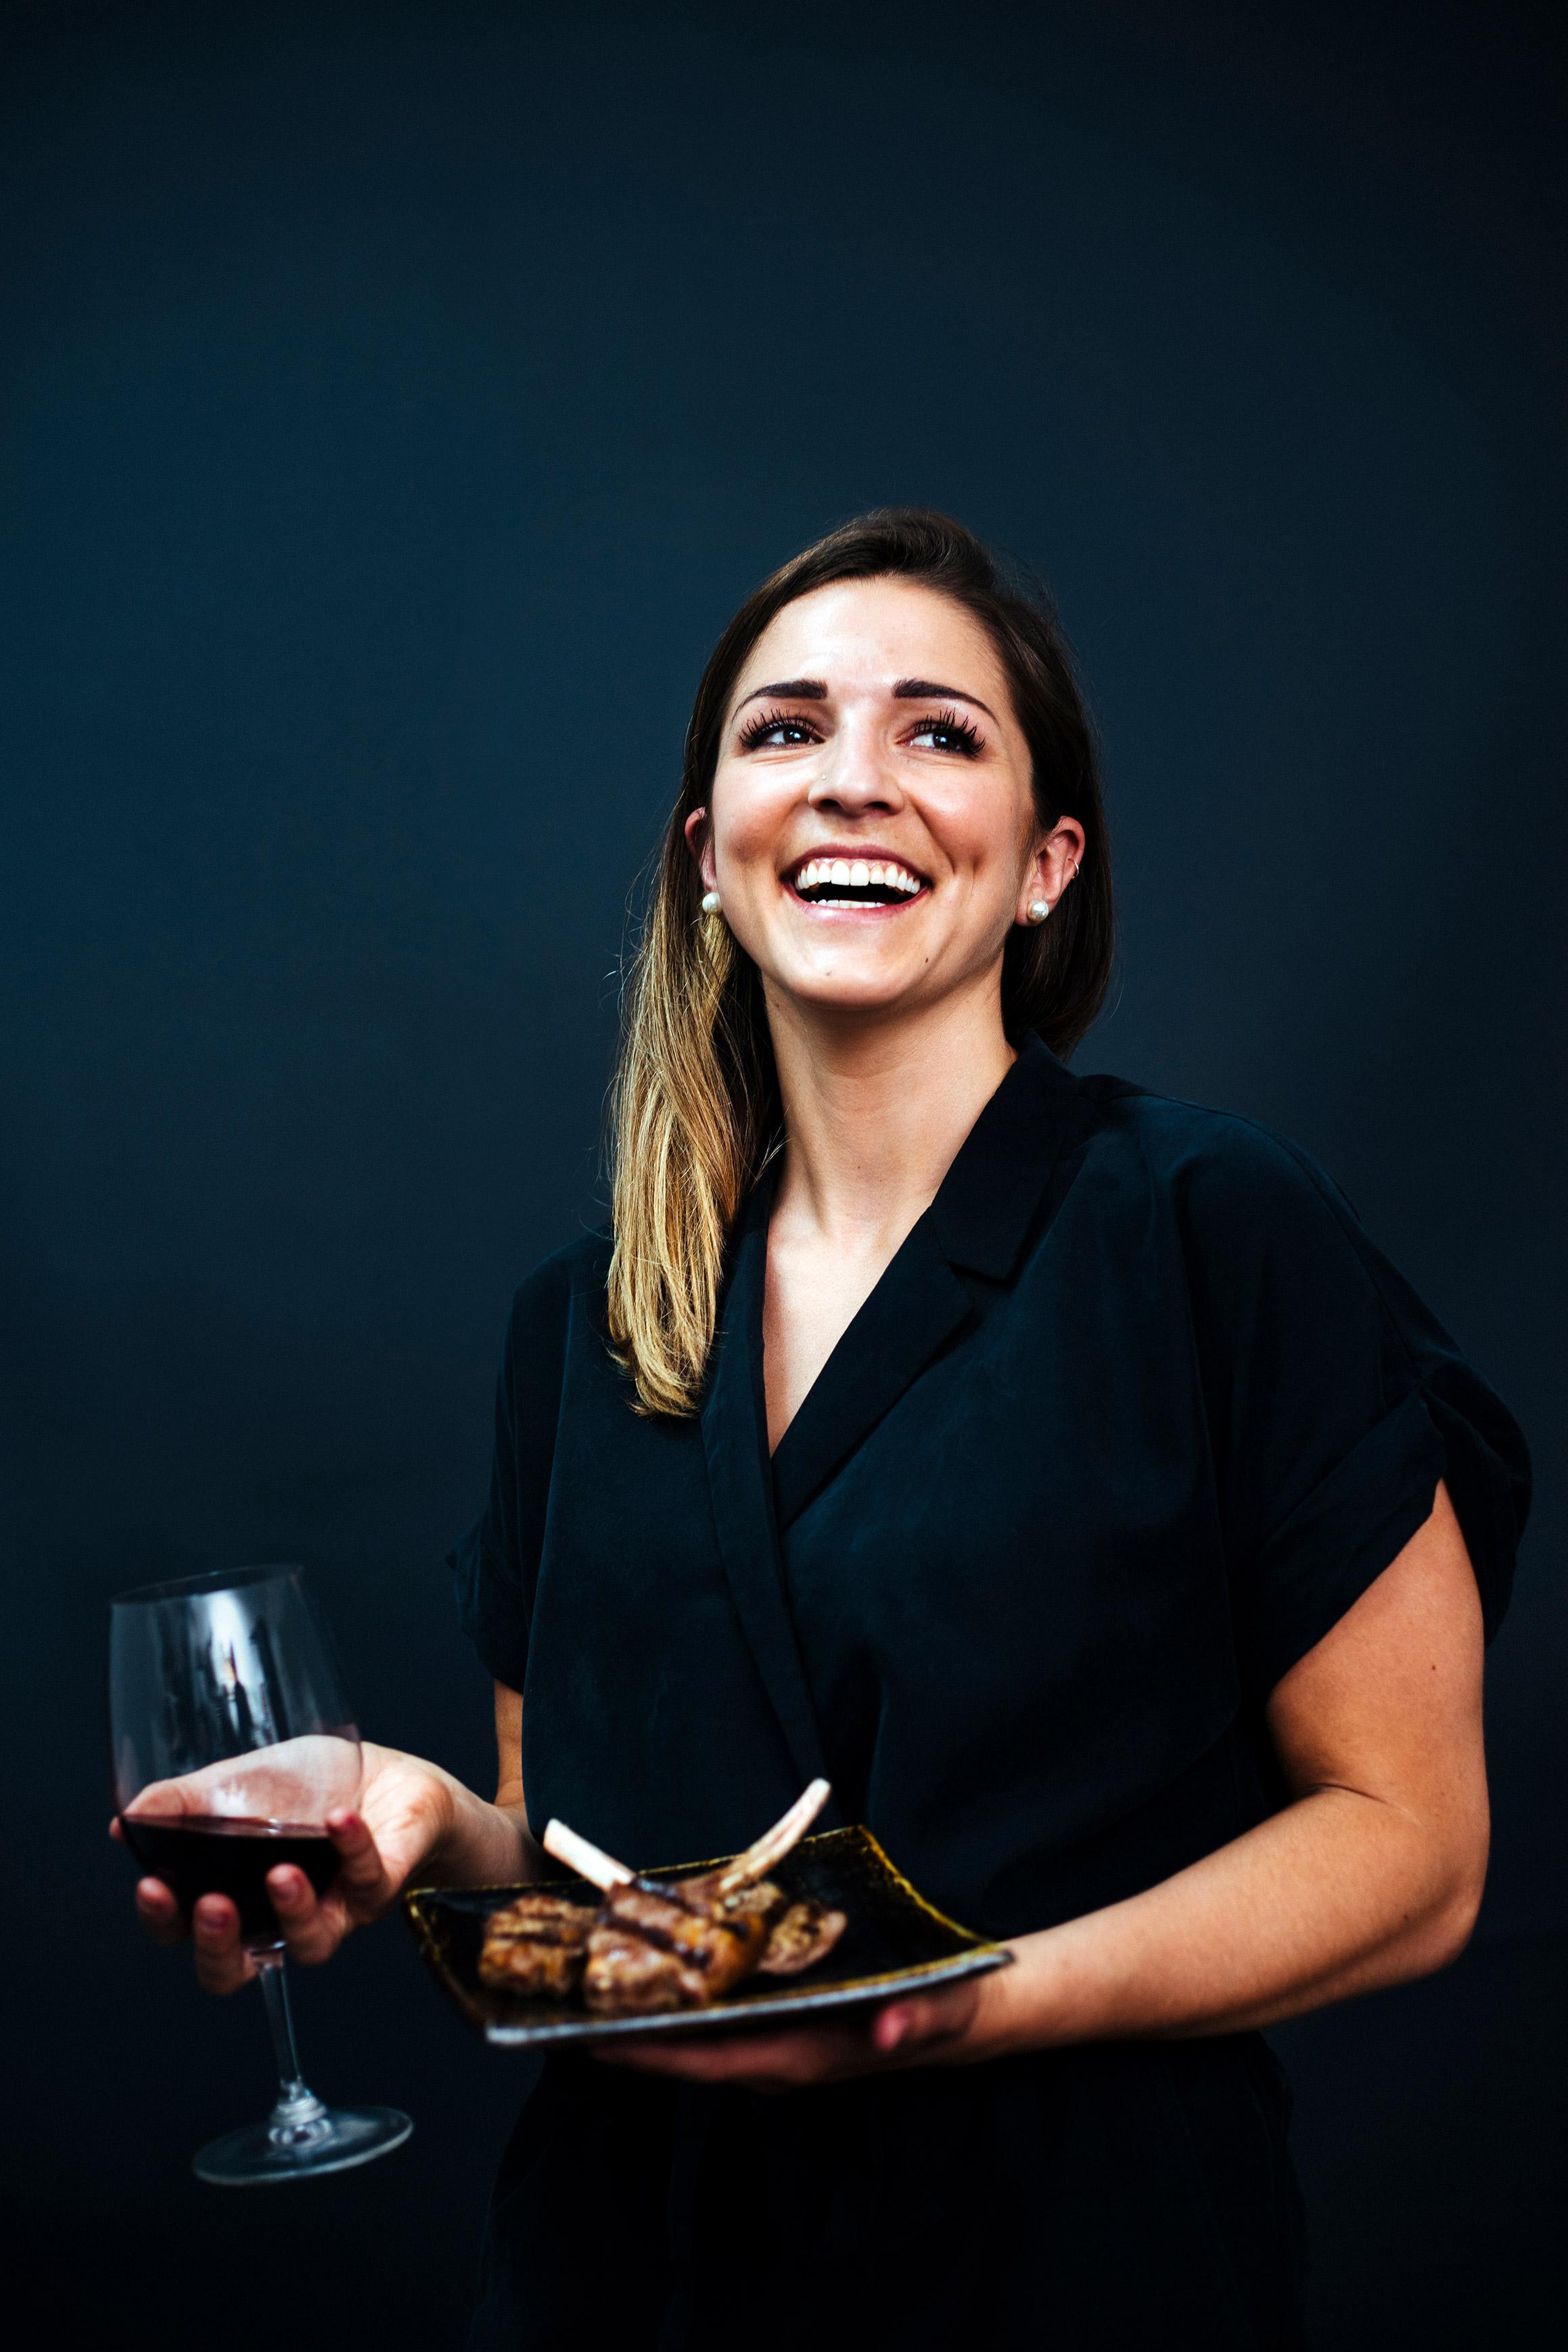 Girl holding wine & dish